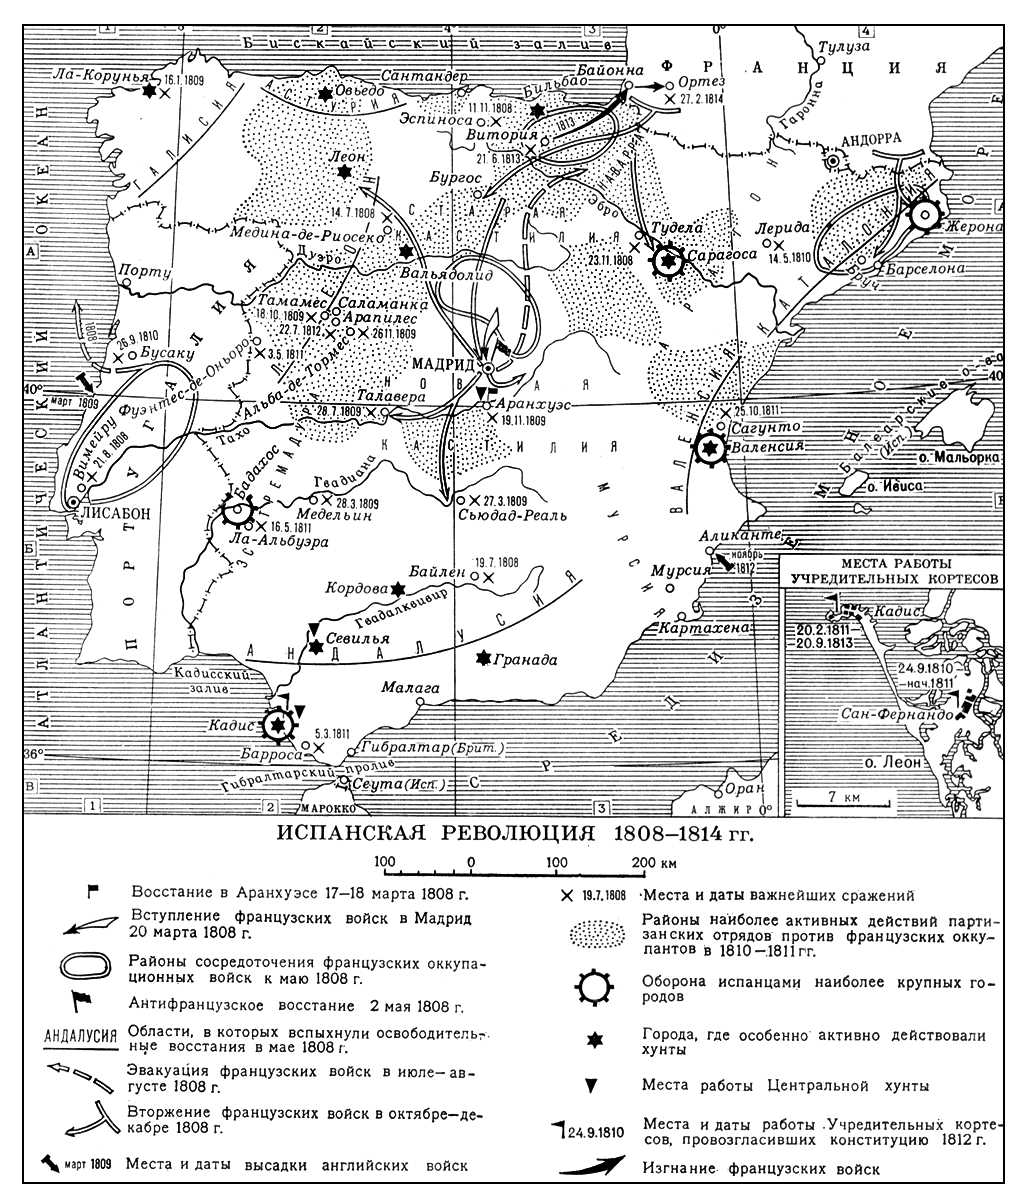 Испанская революция 1808—1814 гг. Испанские революции 19 века.